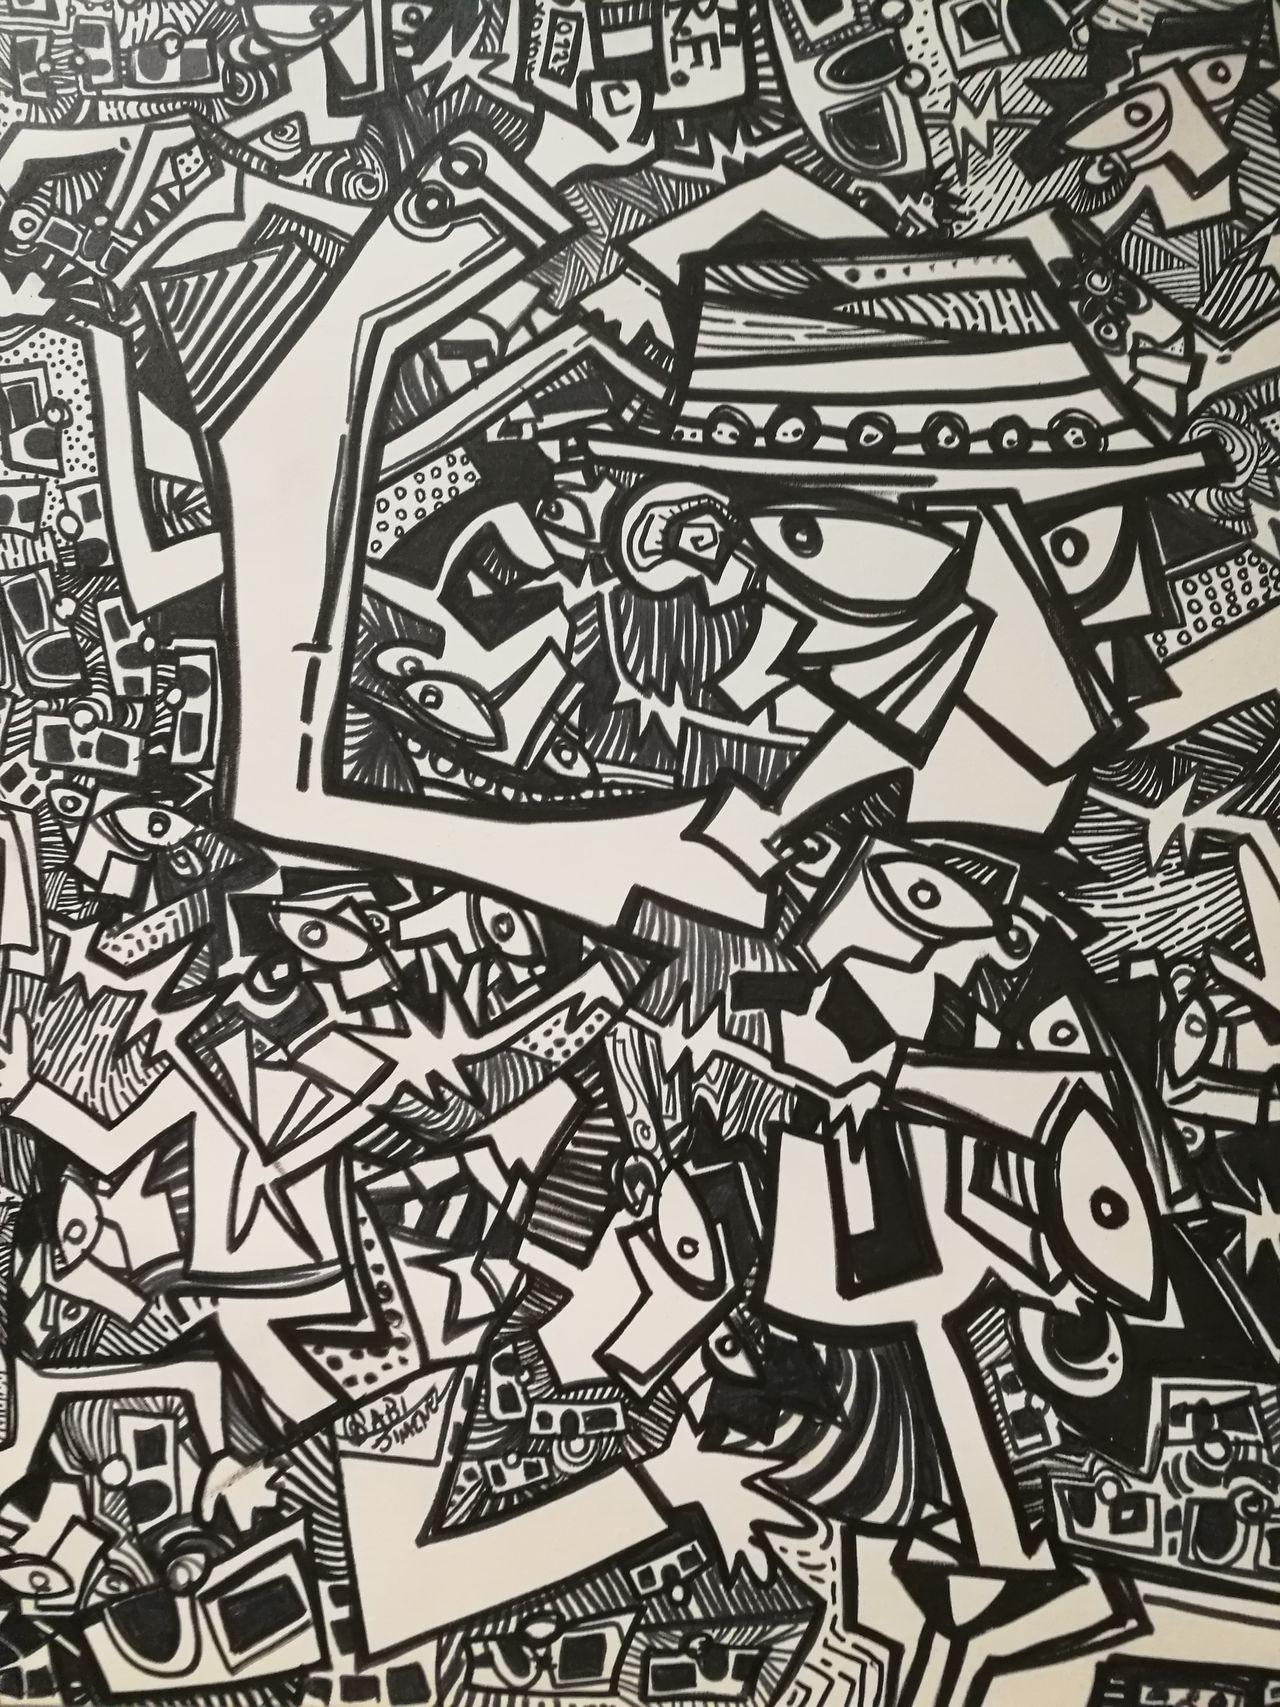 Abstract Paper No People Madrid Sketch Pattern Backgrounds Palacio De Cibeles Black & White Modernart